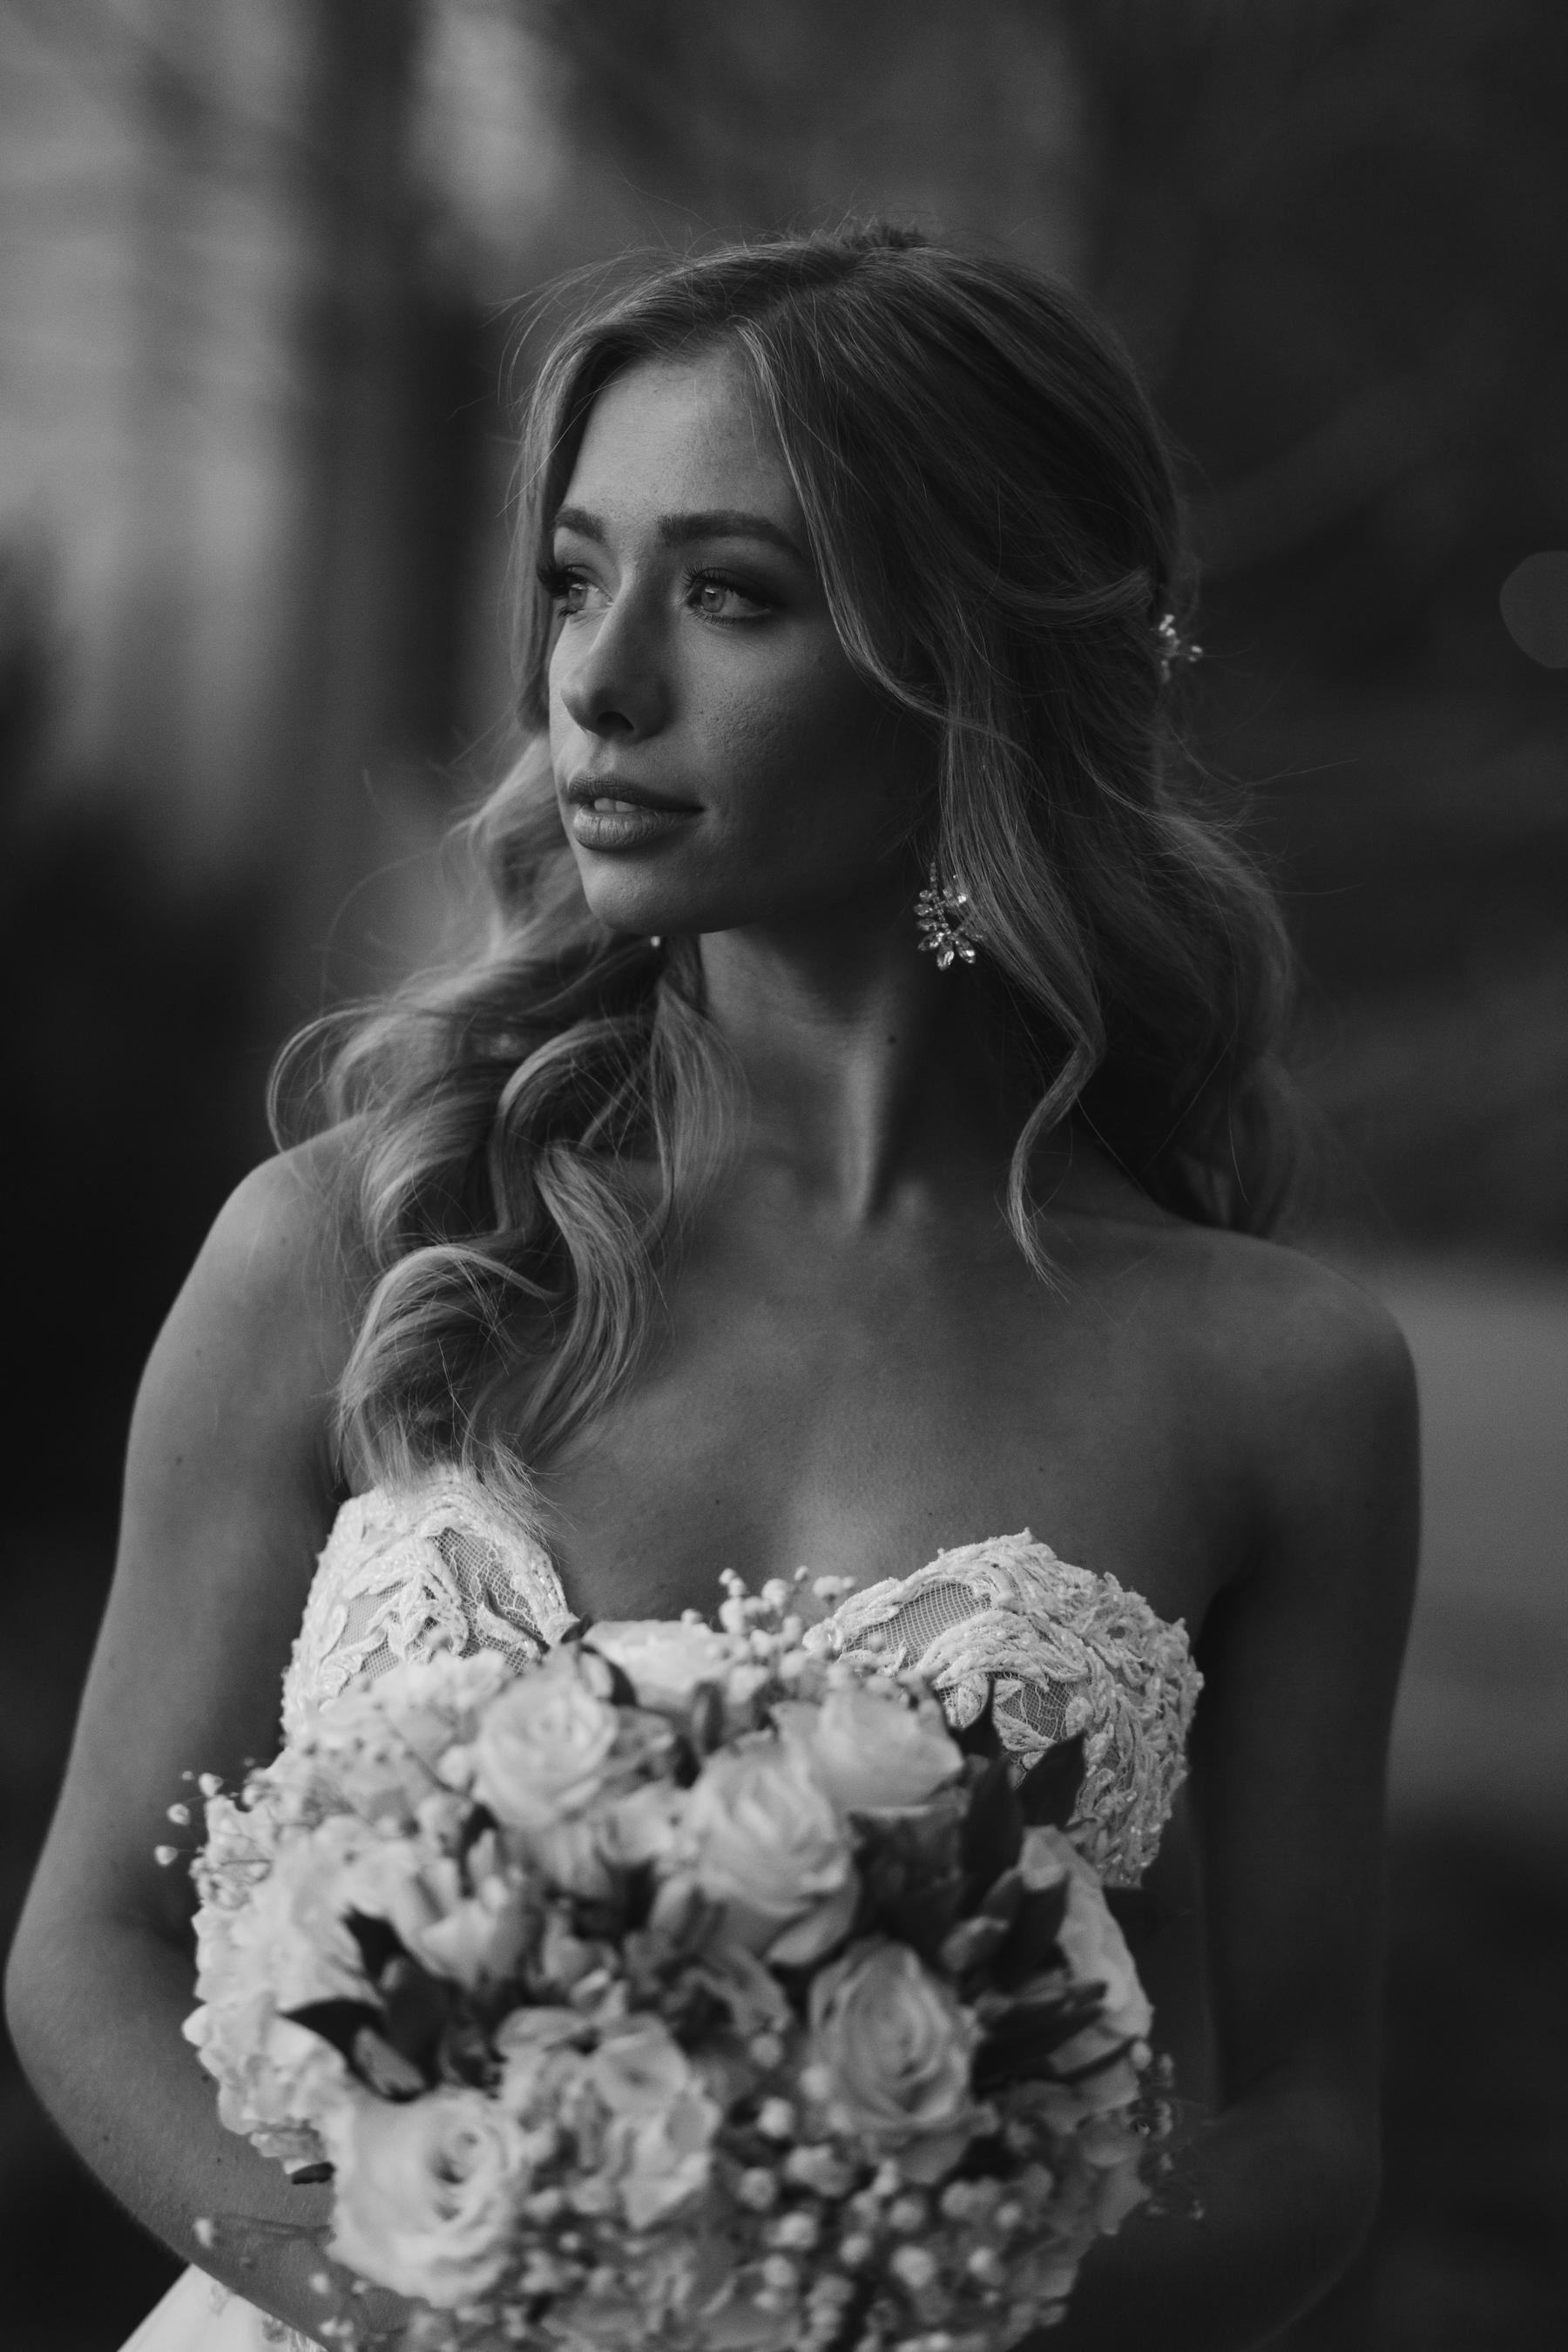 furman-university-bridals-paige-225.JPG